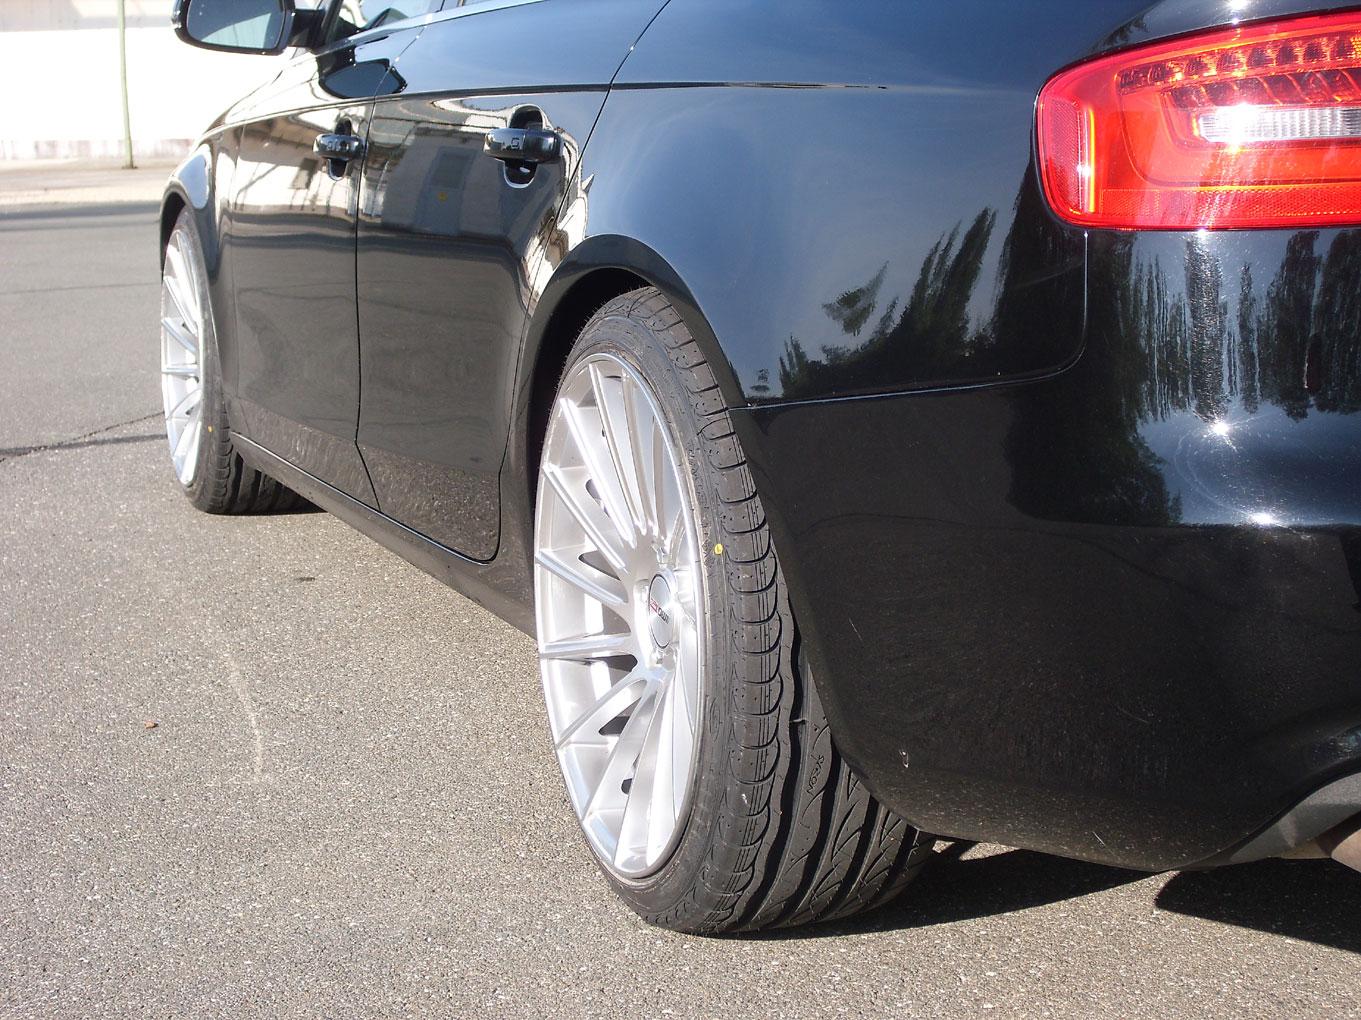 LUK Ausrücklager Audi  A4 A6 Avant A5 Cabriolet Sportback Q5